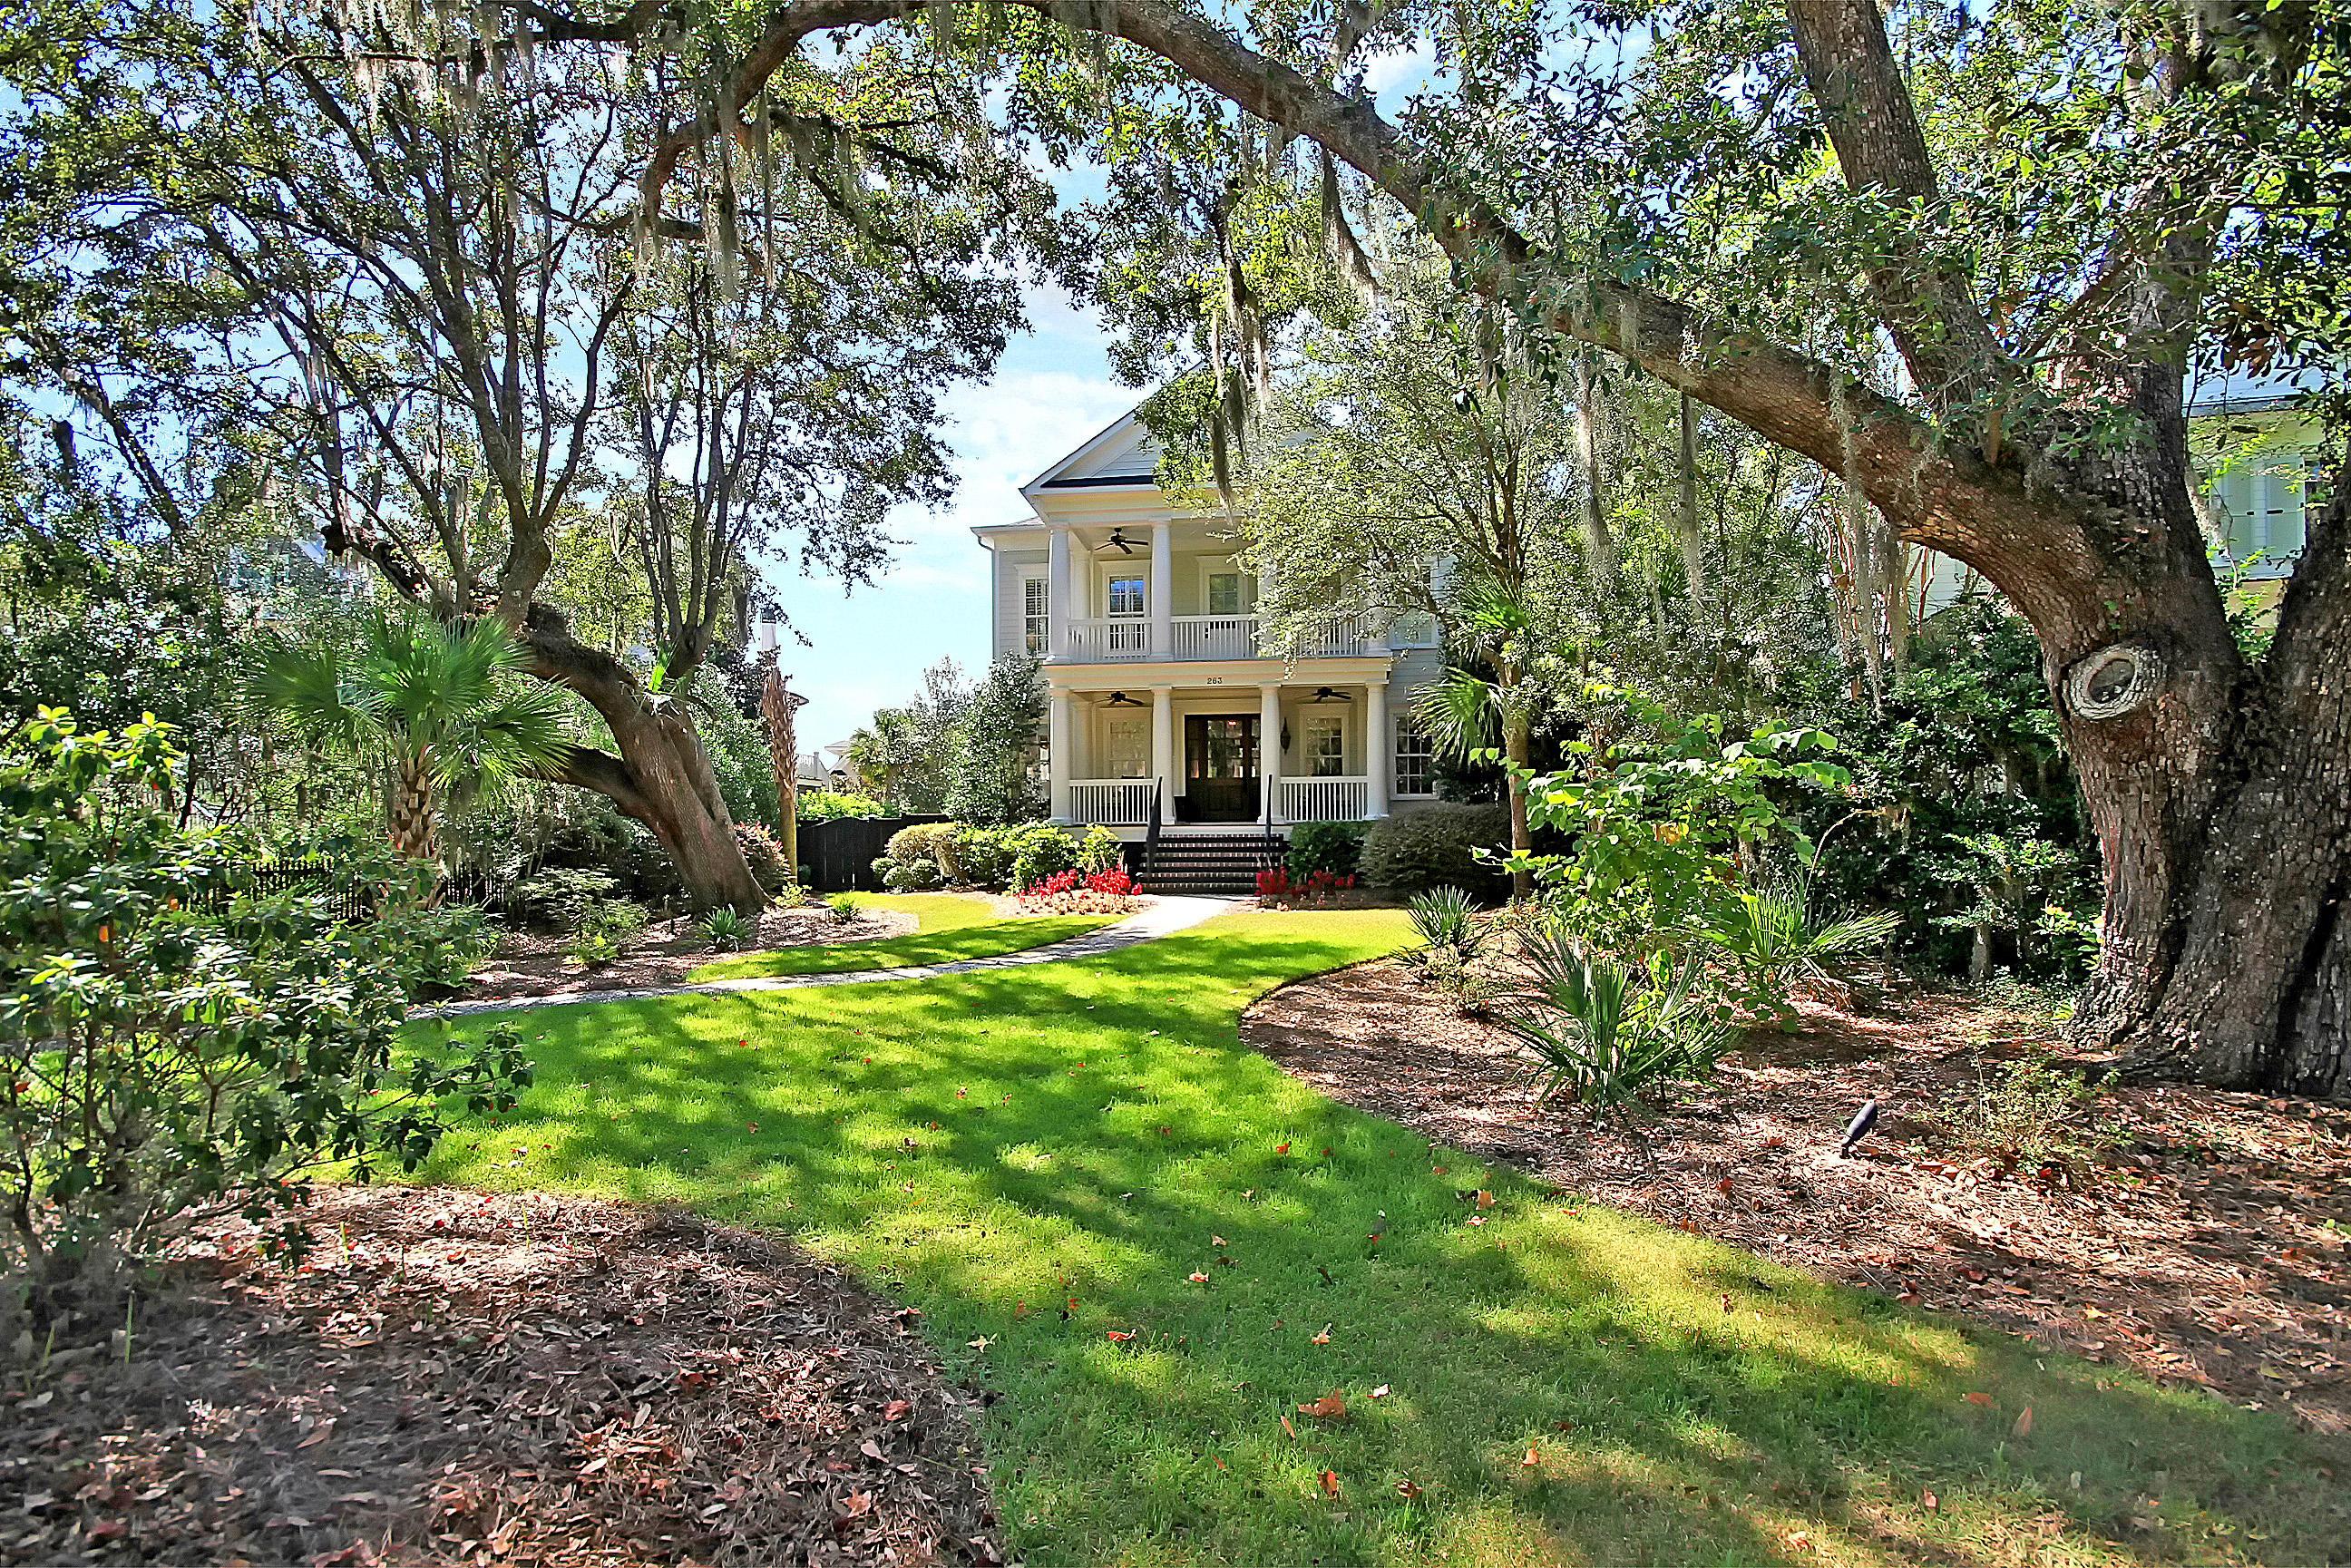 Daniel Island Homes For Sale - 263 Delahow, Daniel Island, SC - 5